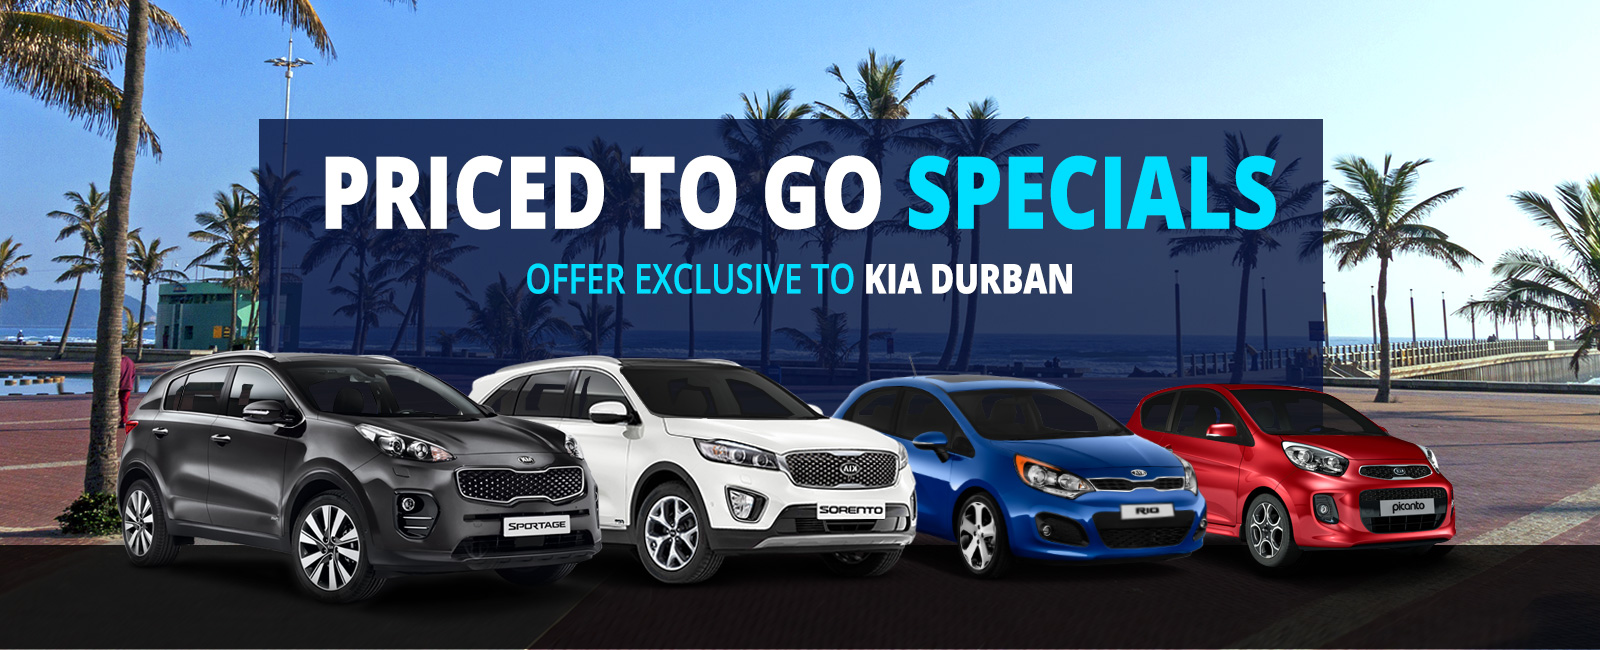 Priced to Go specials - Exclusive to KIA Durban